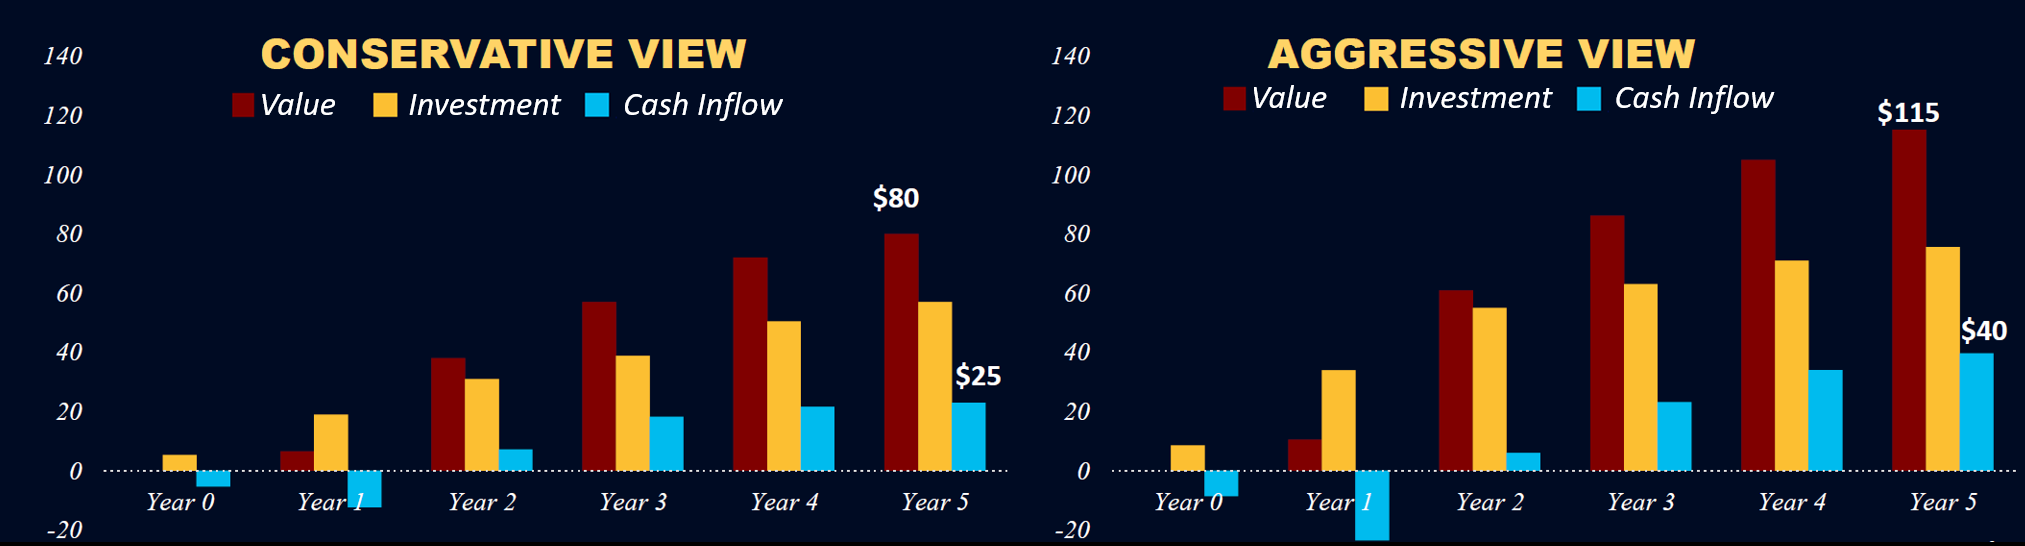 conservative vs aggressive cashflow projection